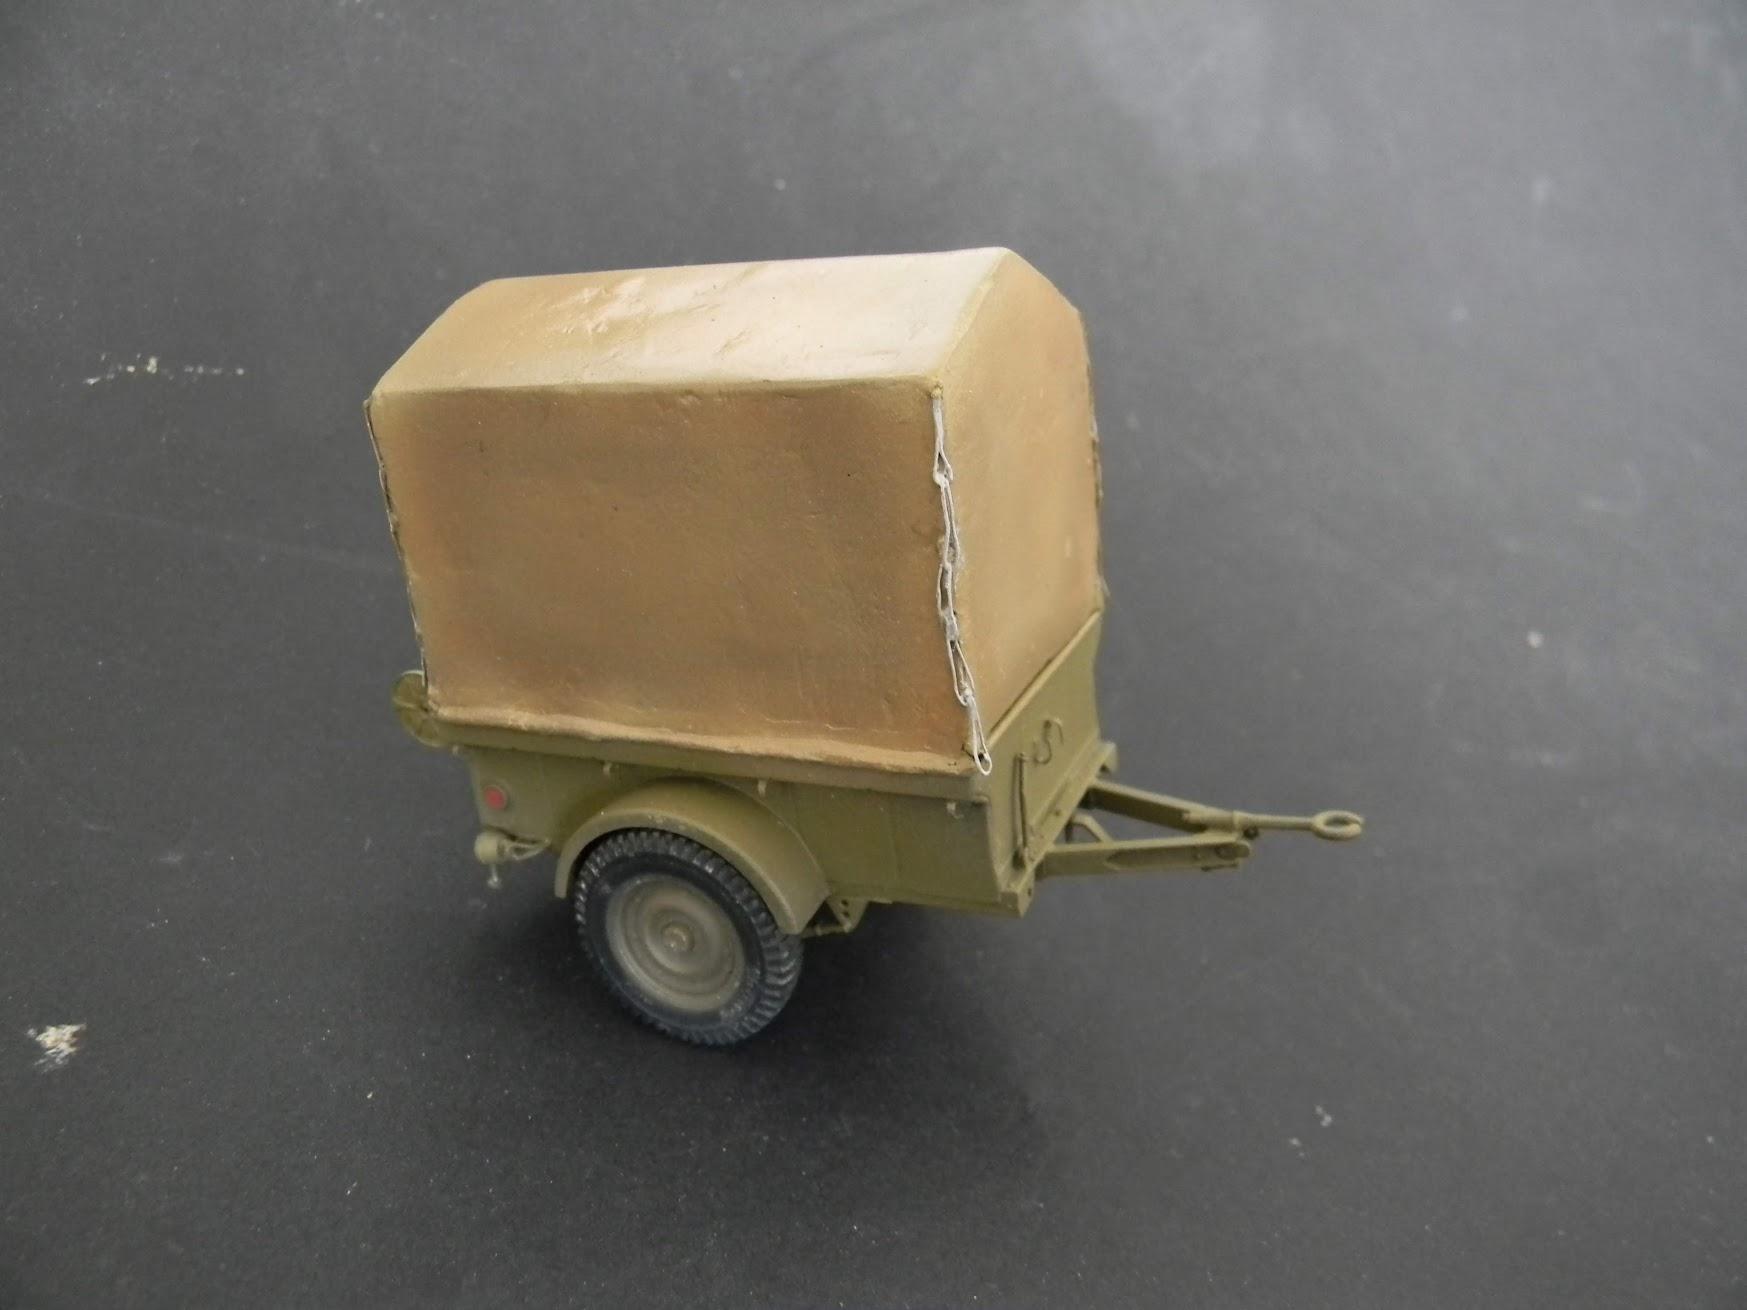 GPW 1942 Ford Bronco Model : revue de détail et montage - Page 5 5sA9jWlOYTvtdSKj10xpZJxKTCW-R2J6p9huFNVJajllhY2mqkOLofIdGoCFRyCTynSkALvFPz_ZVkB6ikAFXDp1gnUxbdZPYMPTeVZuVGfrcwys6Zwgdt1tXeYL_A16gKFPLA7pX4UHolzUUo2cyESlqCkHXzoQH7bSDIYP_d85KoRwmeXbiFwk6lRhI1Sl39Ew8S9RTPnihwX9YSrzaForSDcyaJGrkP39eHMPViUBwBhaysmcH5kTzbqgJZ_h7qzRr65BmLkdtaakcdyCIkxTKjtn95uxux6lnLA26OJ9vf7W5x5s37NnWjzZZvjCZrGEDJko1PBd8jvsoiM-S3C0ydV3sPVEmh6o9VC73i1nkS3oLFYos_hqG6YdYoq6u1VsgCmUScz8GmZgKI2Mq22-GSo0i2qtlwvnq5epfUDumjsqwrVUuTjTJnF0fZCJV8WD8RXx42dwCT1pRUkyXrkT8mo43pc1gGUUQeKUyS2TiTcj_F_iESHTZLrCcGJe7O9pgSb1U6wska9Wf6iSVwf8_4O_2WXl96G72GCHESyO3TMDmQn8OjjSCJyxhWbfqiqDFlyDJMUdbc8a5hw82xvgGODew06qlvF9yR1b6Bbj6qaOY6Tr9ZvU5iB9M0_88WyWTrFyb0nyGWCR8TOX5UAMmqtPEceJUh08bAcn71knoDlpjr8JBbXVr1EFYbL9Qlttz-G3VH_rhyyTYS1fv64_FICFPxeU7TzI8FqYcycR3BiwFQ=w1747-h1310-no